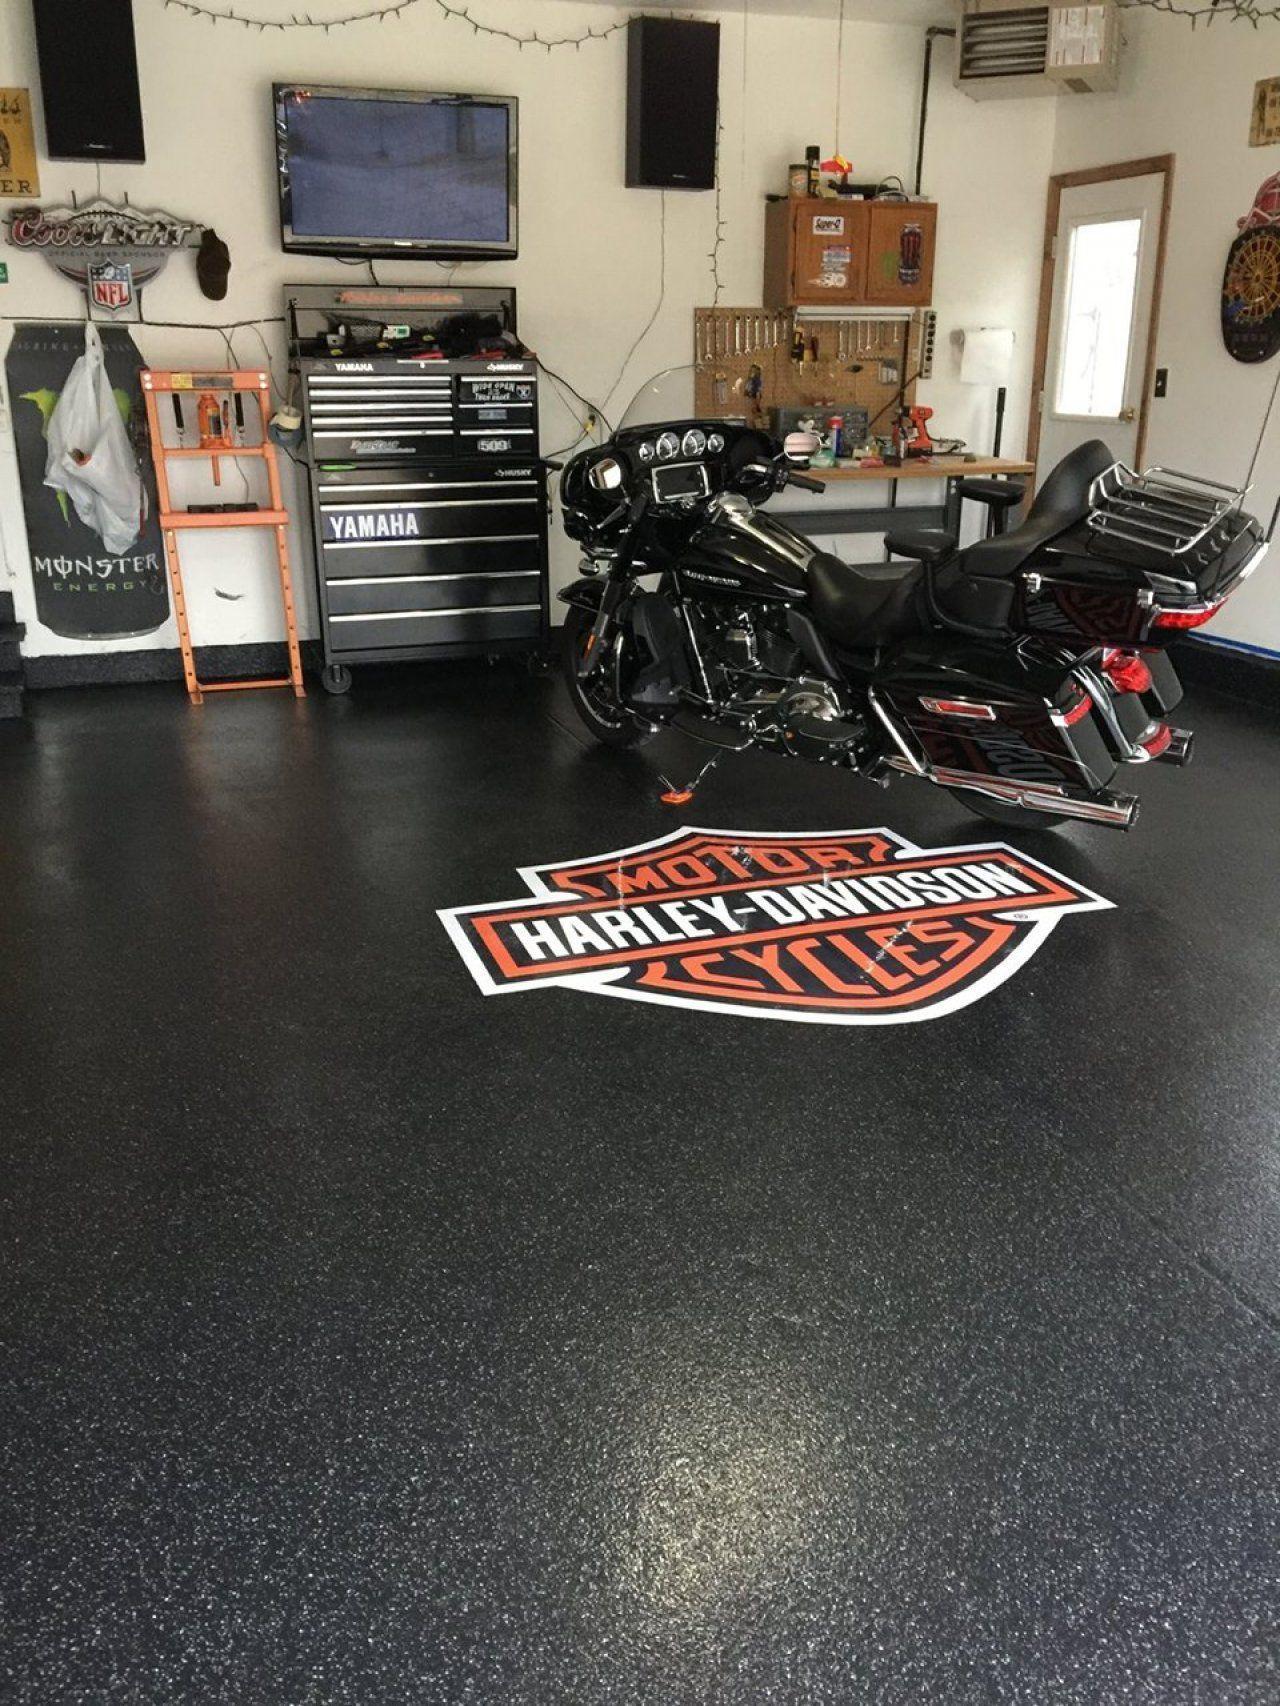 Man Cave Garage Flooring With Harley Davidson Logo Contact Garagemancaves Man Cave Garage Flooring With H Garage Epoxy Garage Floor Epoxy Garage Floor Coating